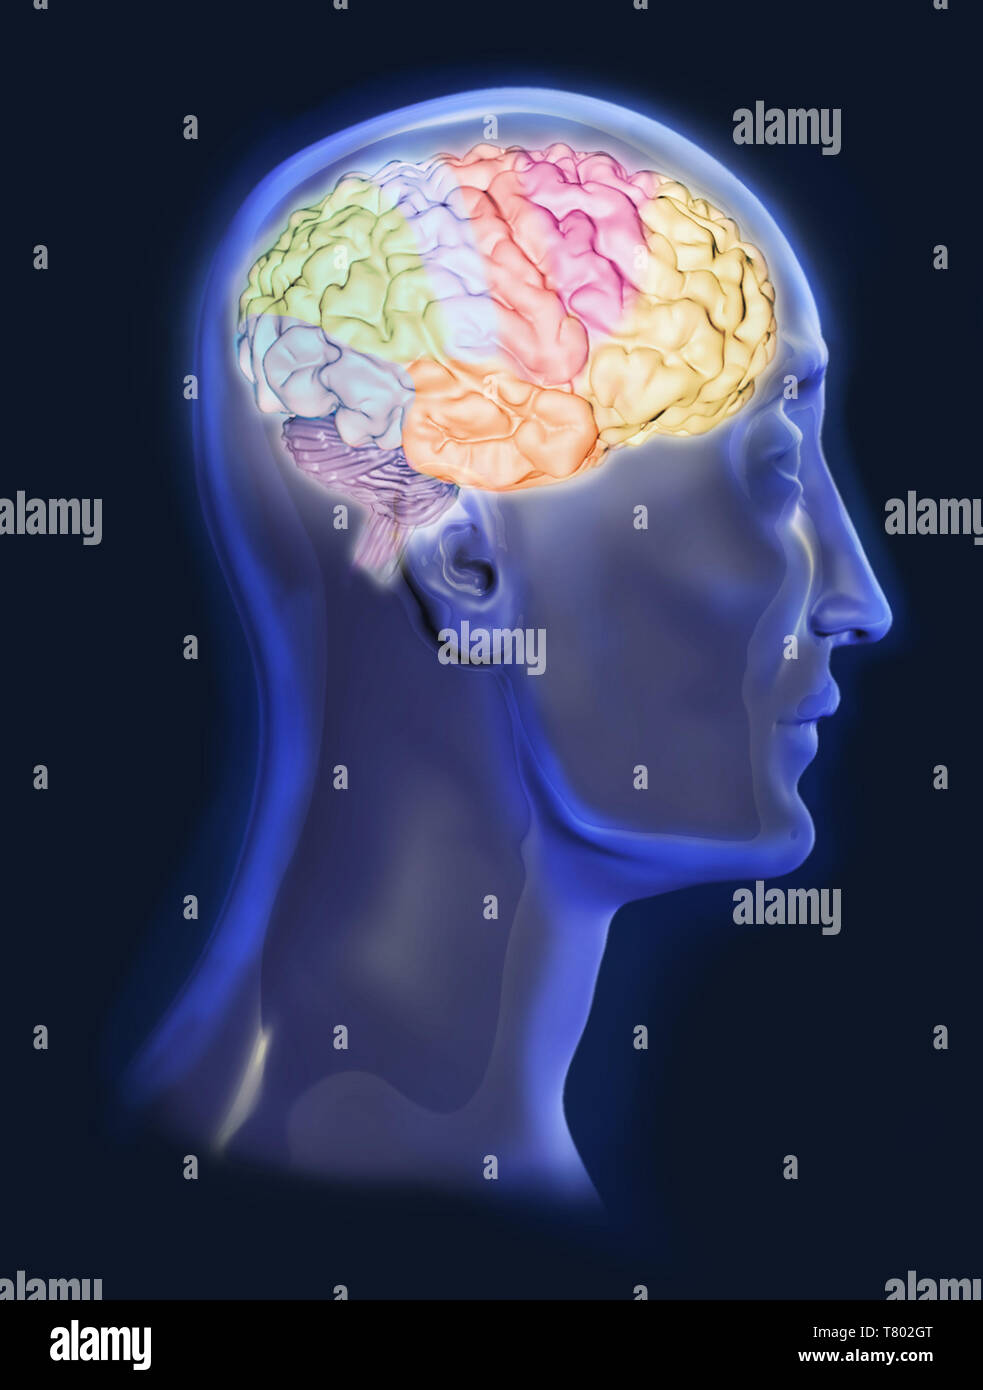 Brain, Illustration - Stock Image